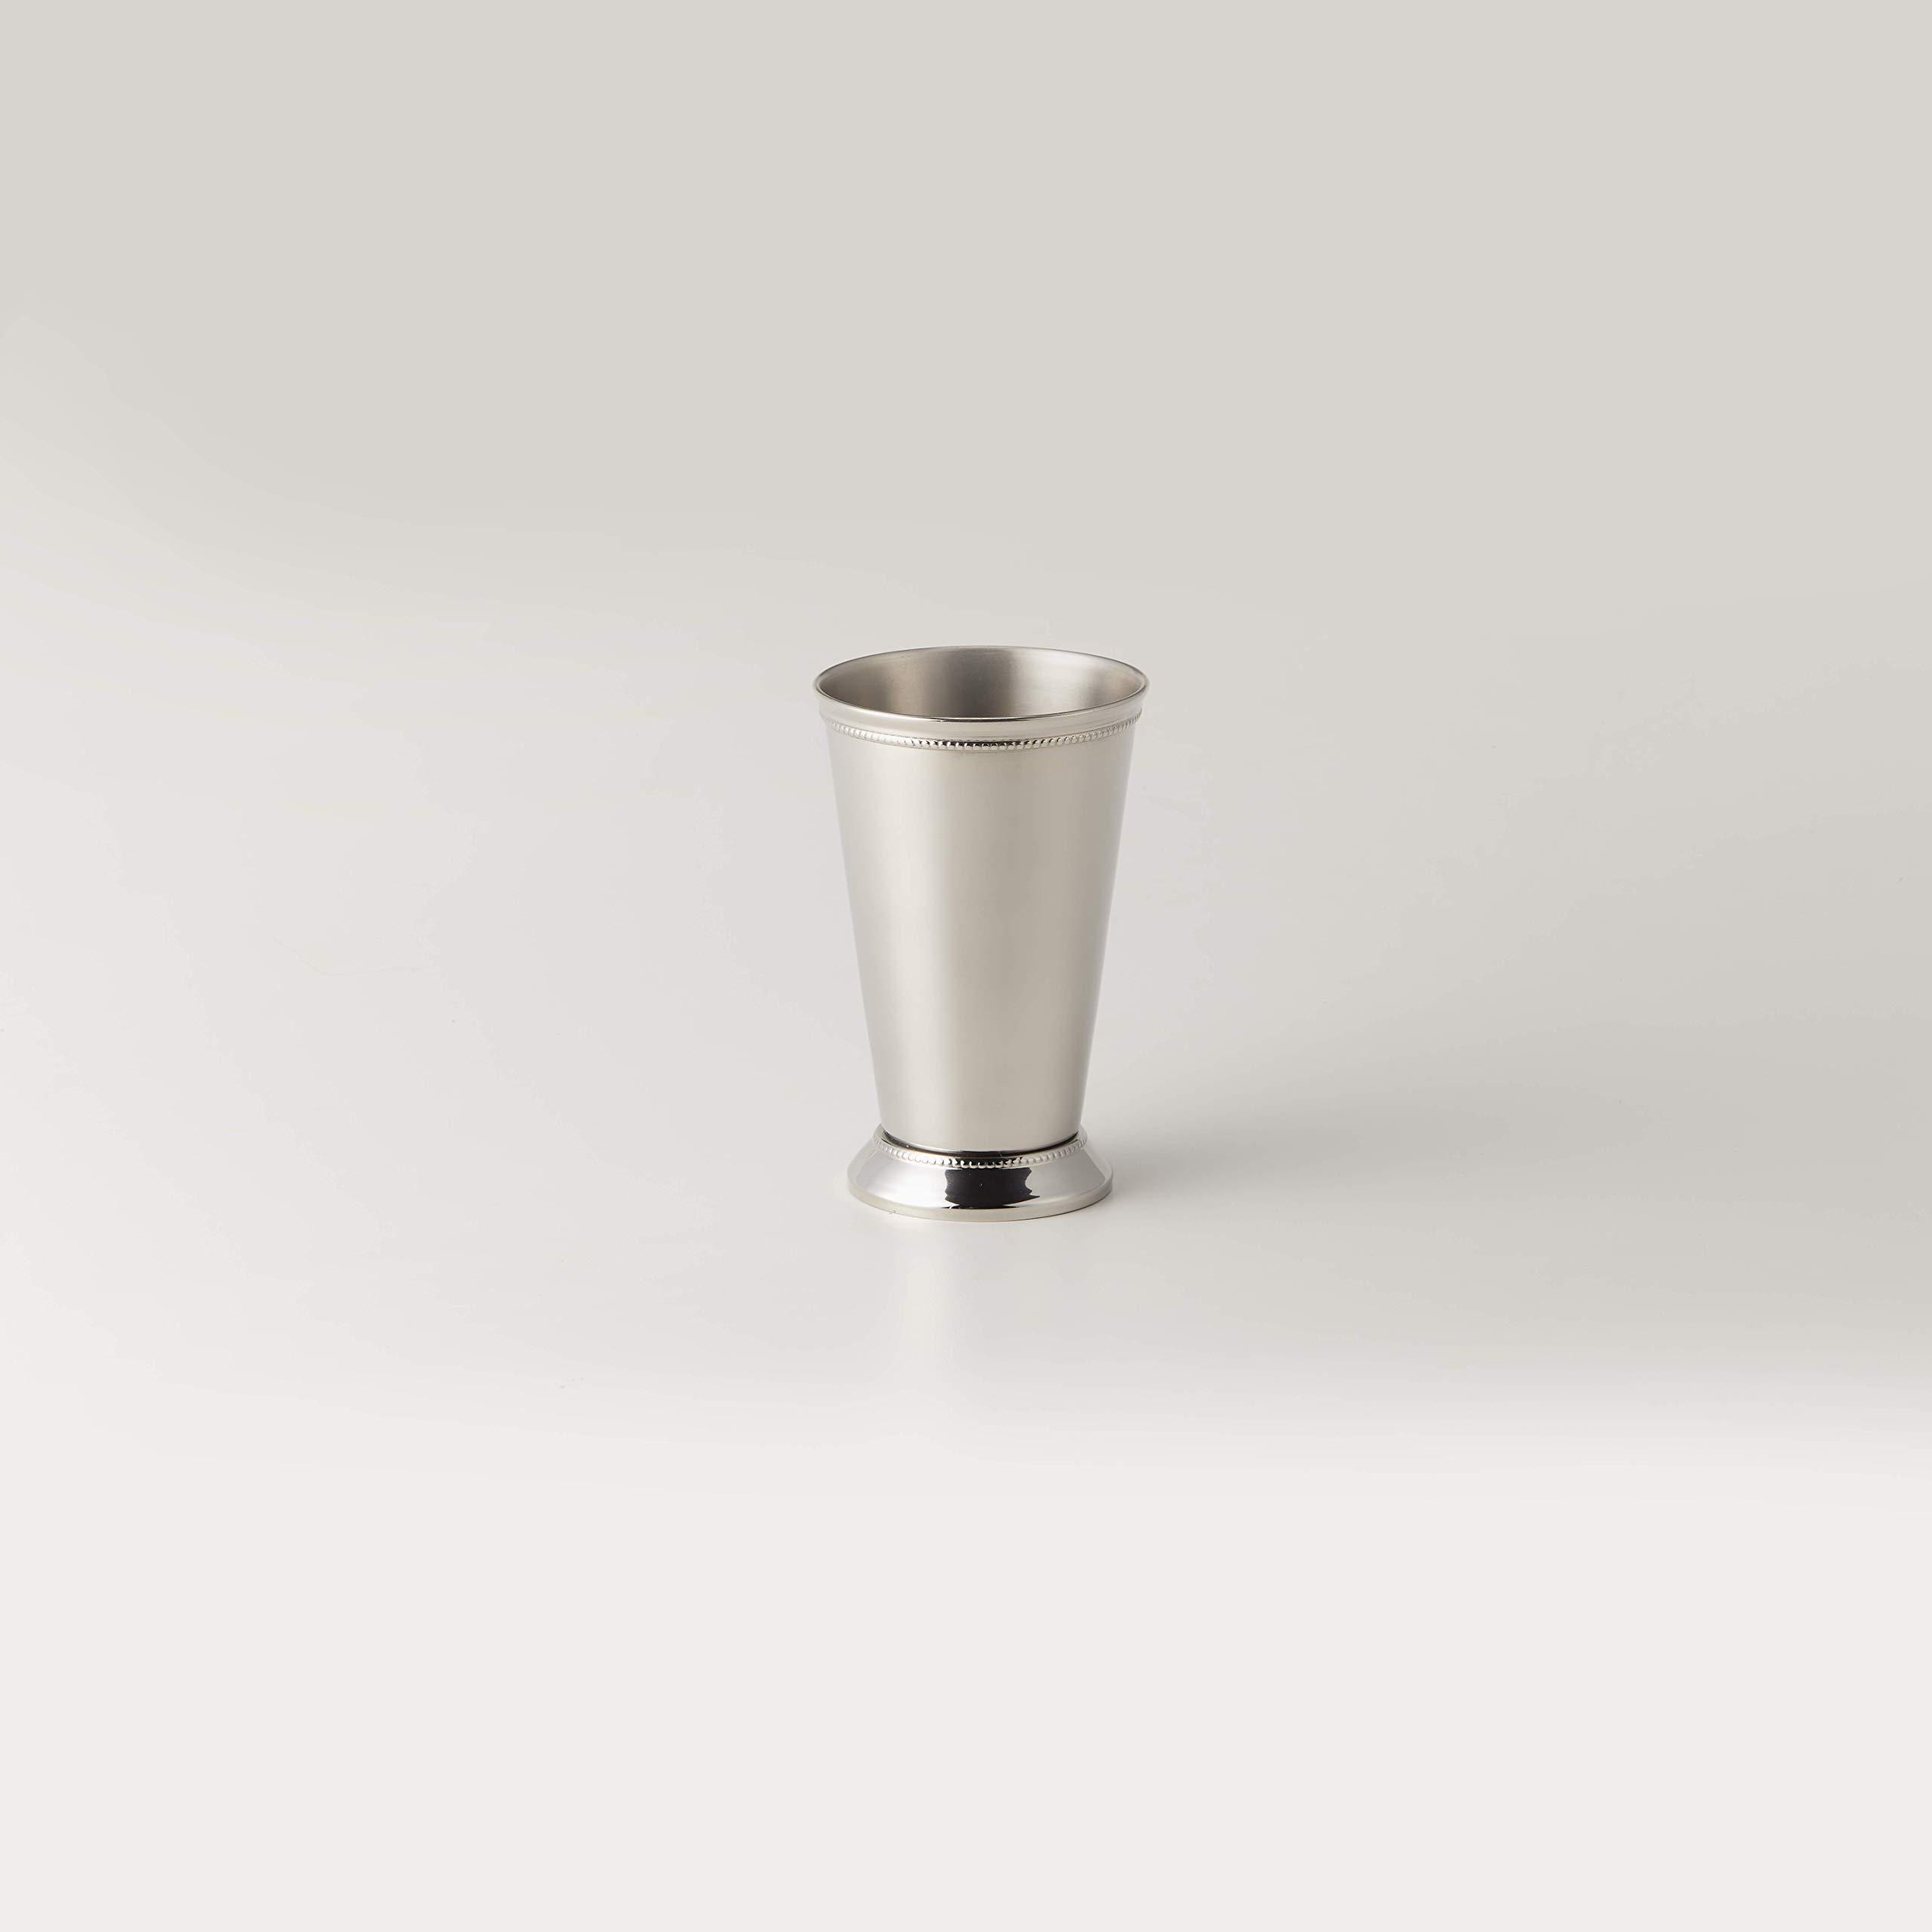 American Metalcraft JC16 Classic Mint Julep Cup, 16-Ounces